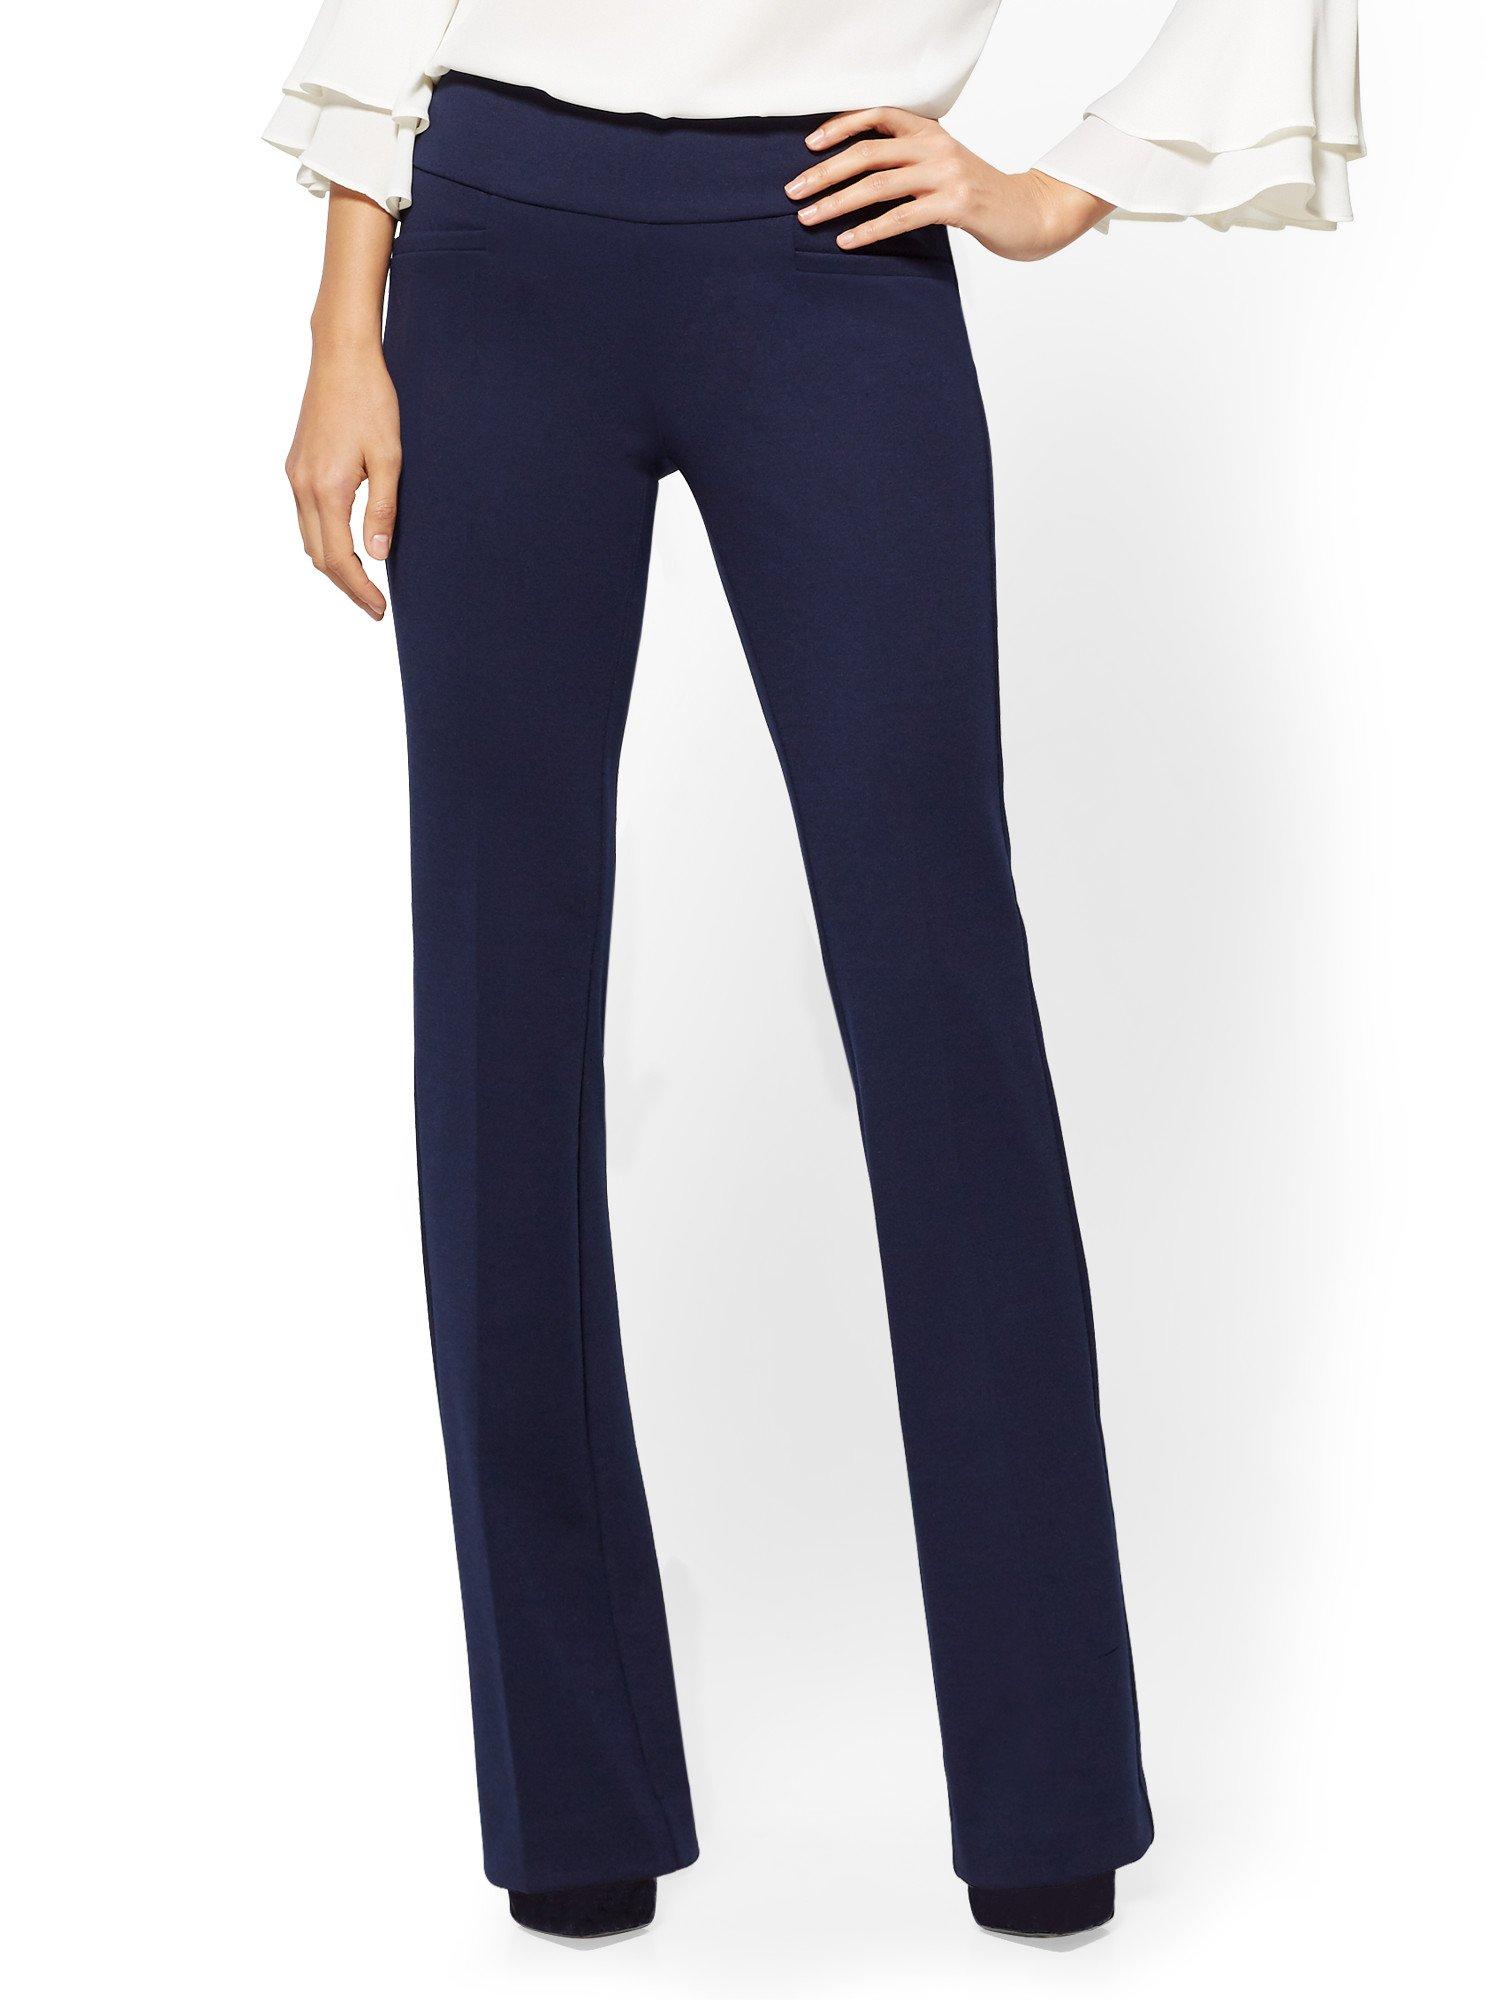 New York & Co. 7Th Avenue Tall Pant - Bootcut Medium Grand Sapphire